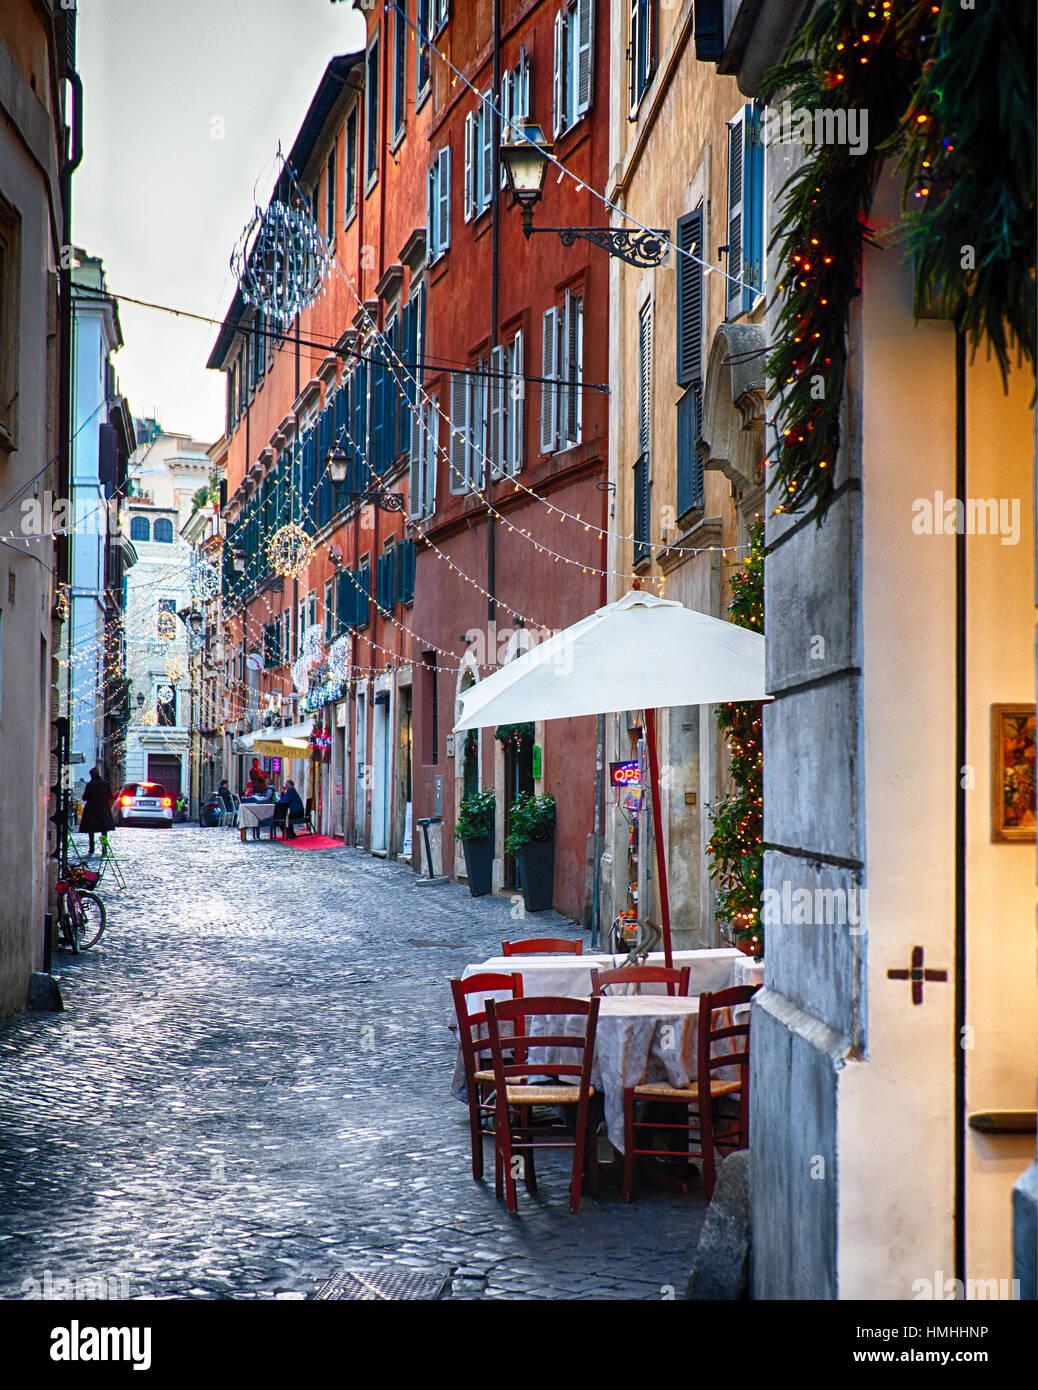 Alley à Rome pendant les vacances de Noël, Via Del Orso, Rome, Latium, Italie Photo Stock